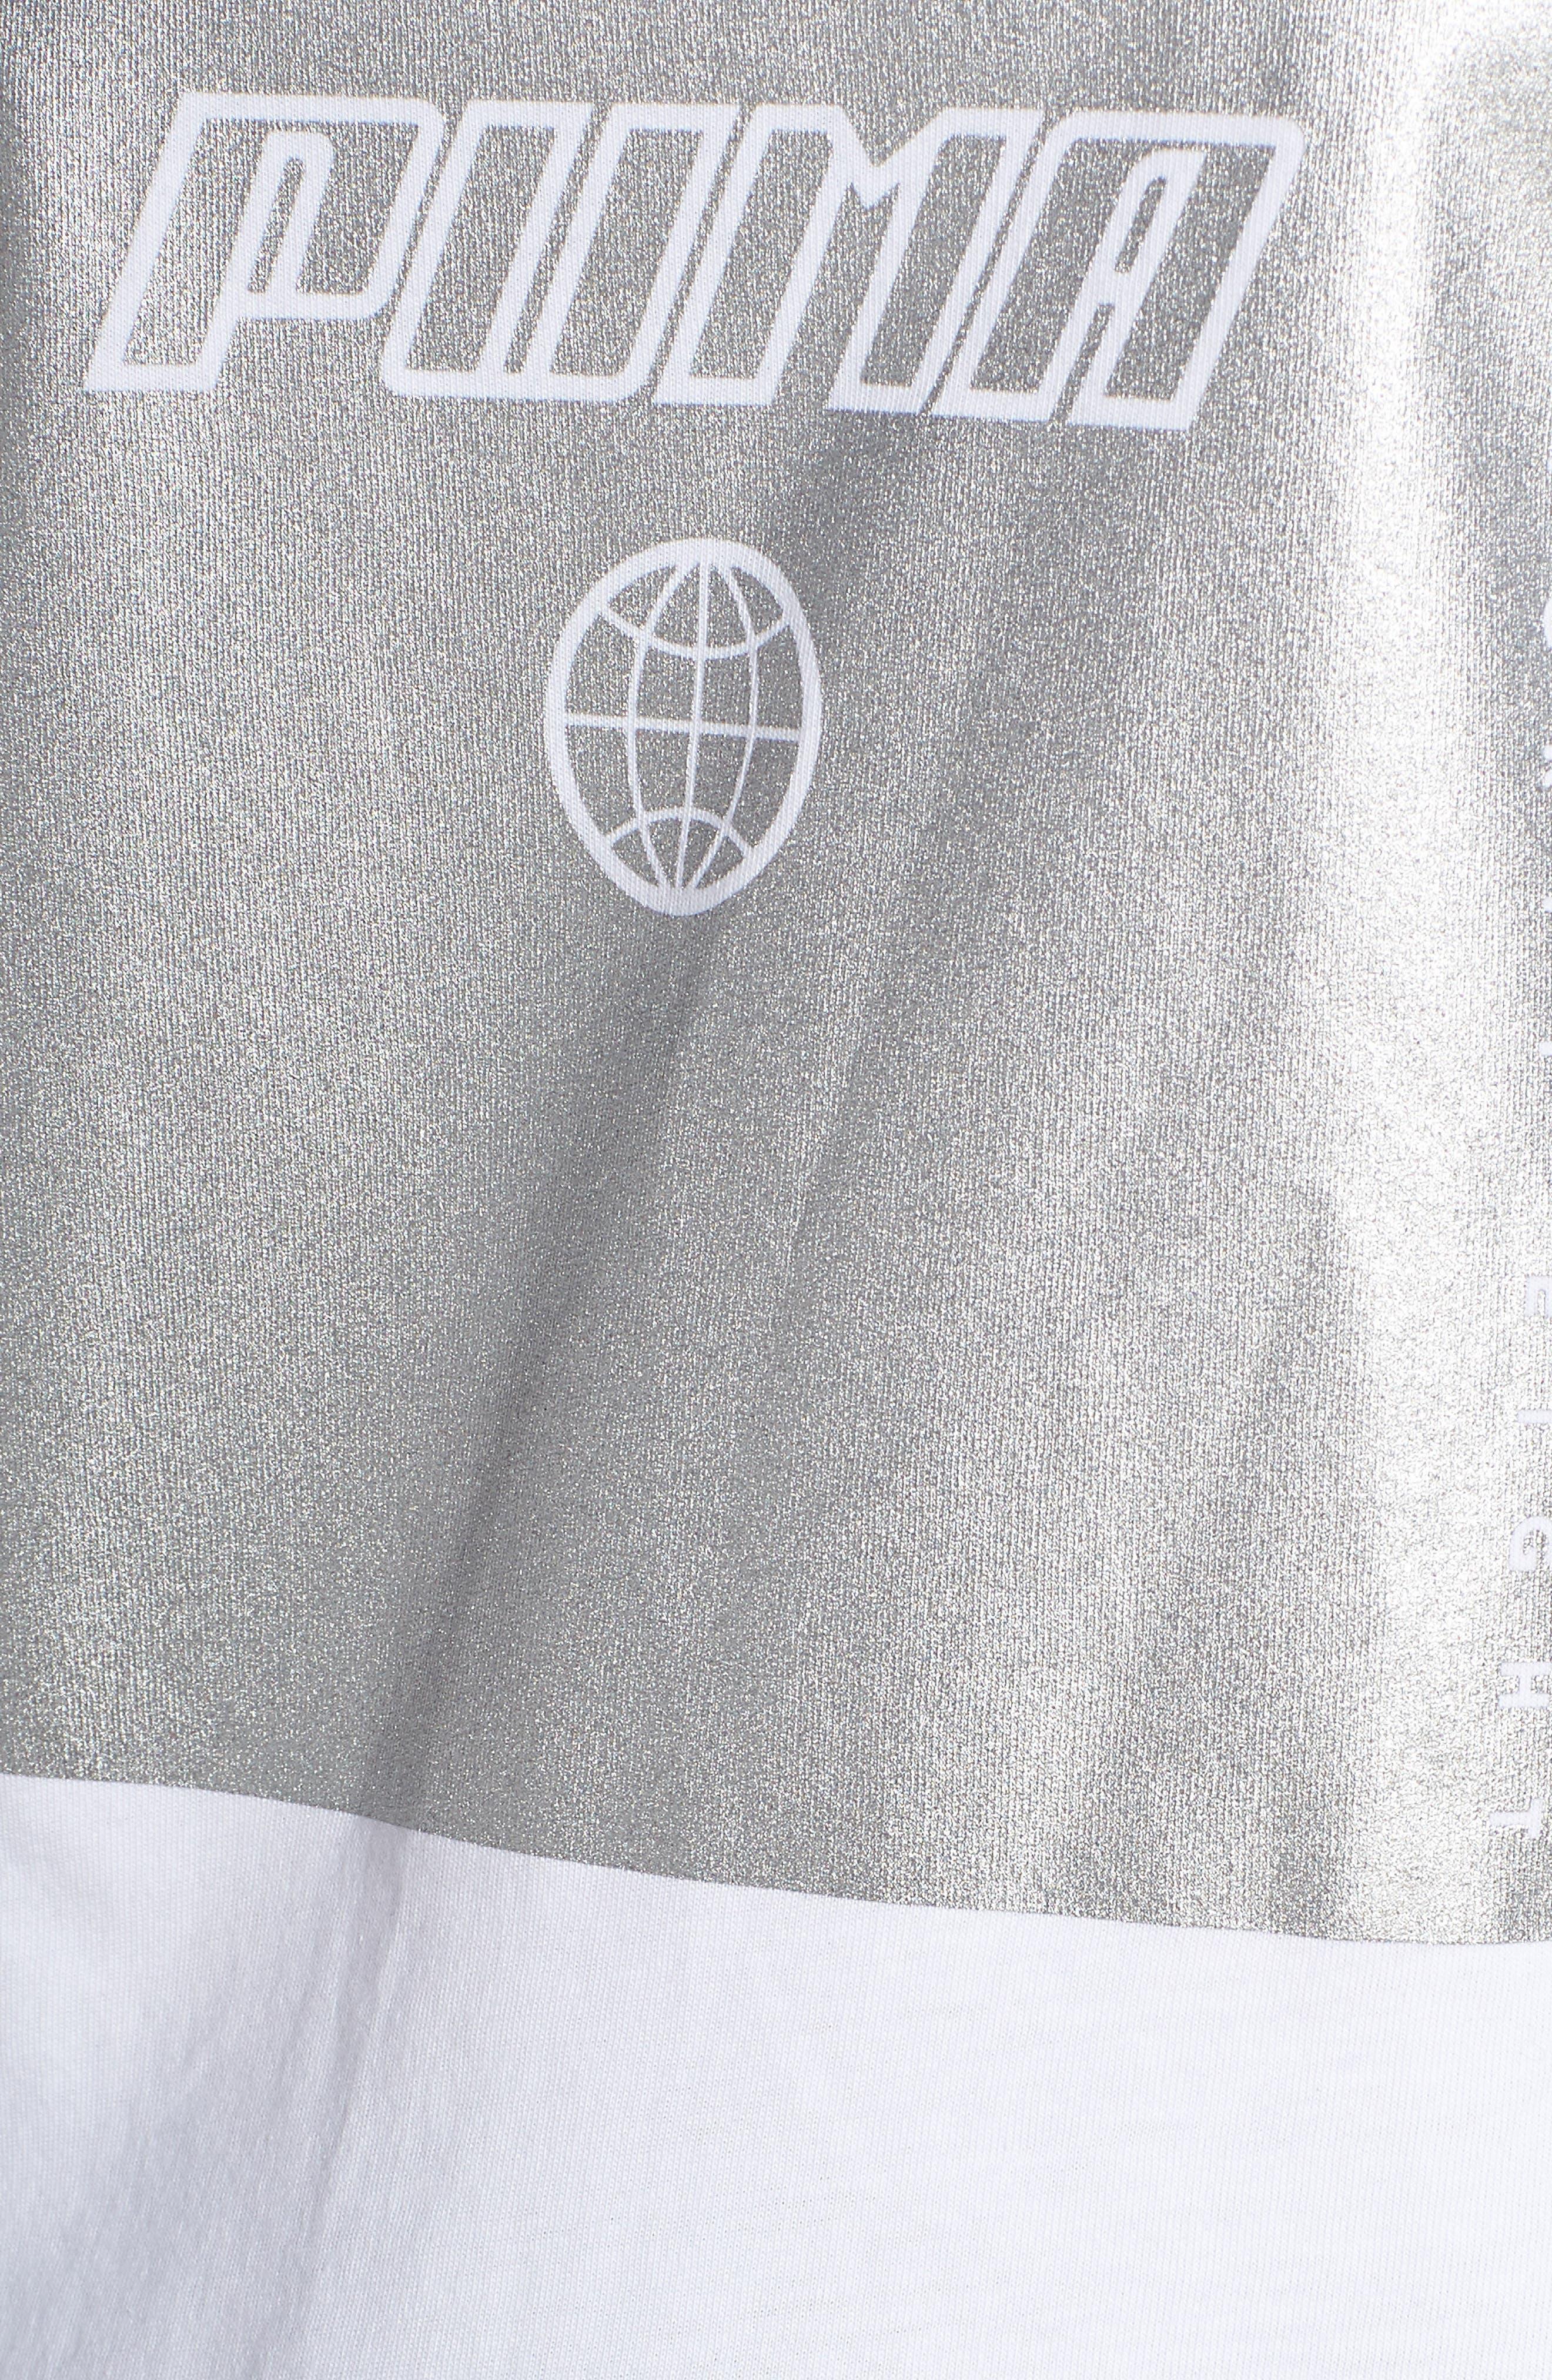 PUMA, TZ Logo Tee, Alternate thumbnail 6, color, PUMA WHITE